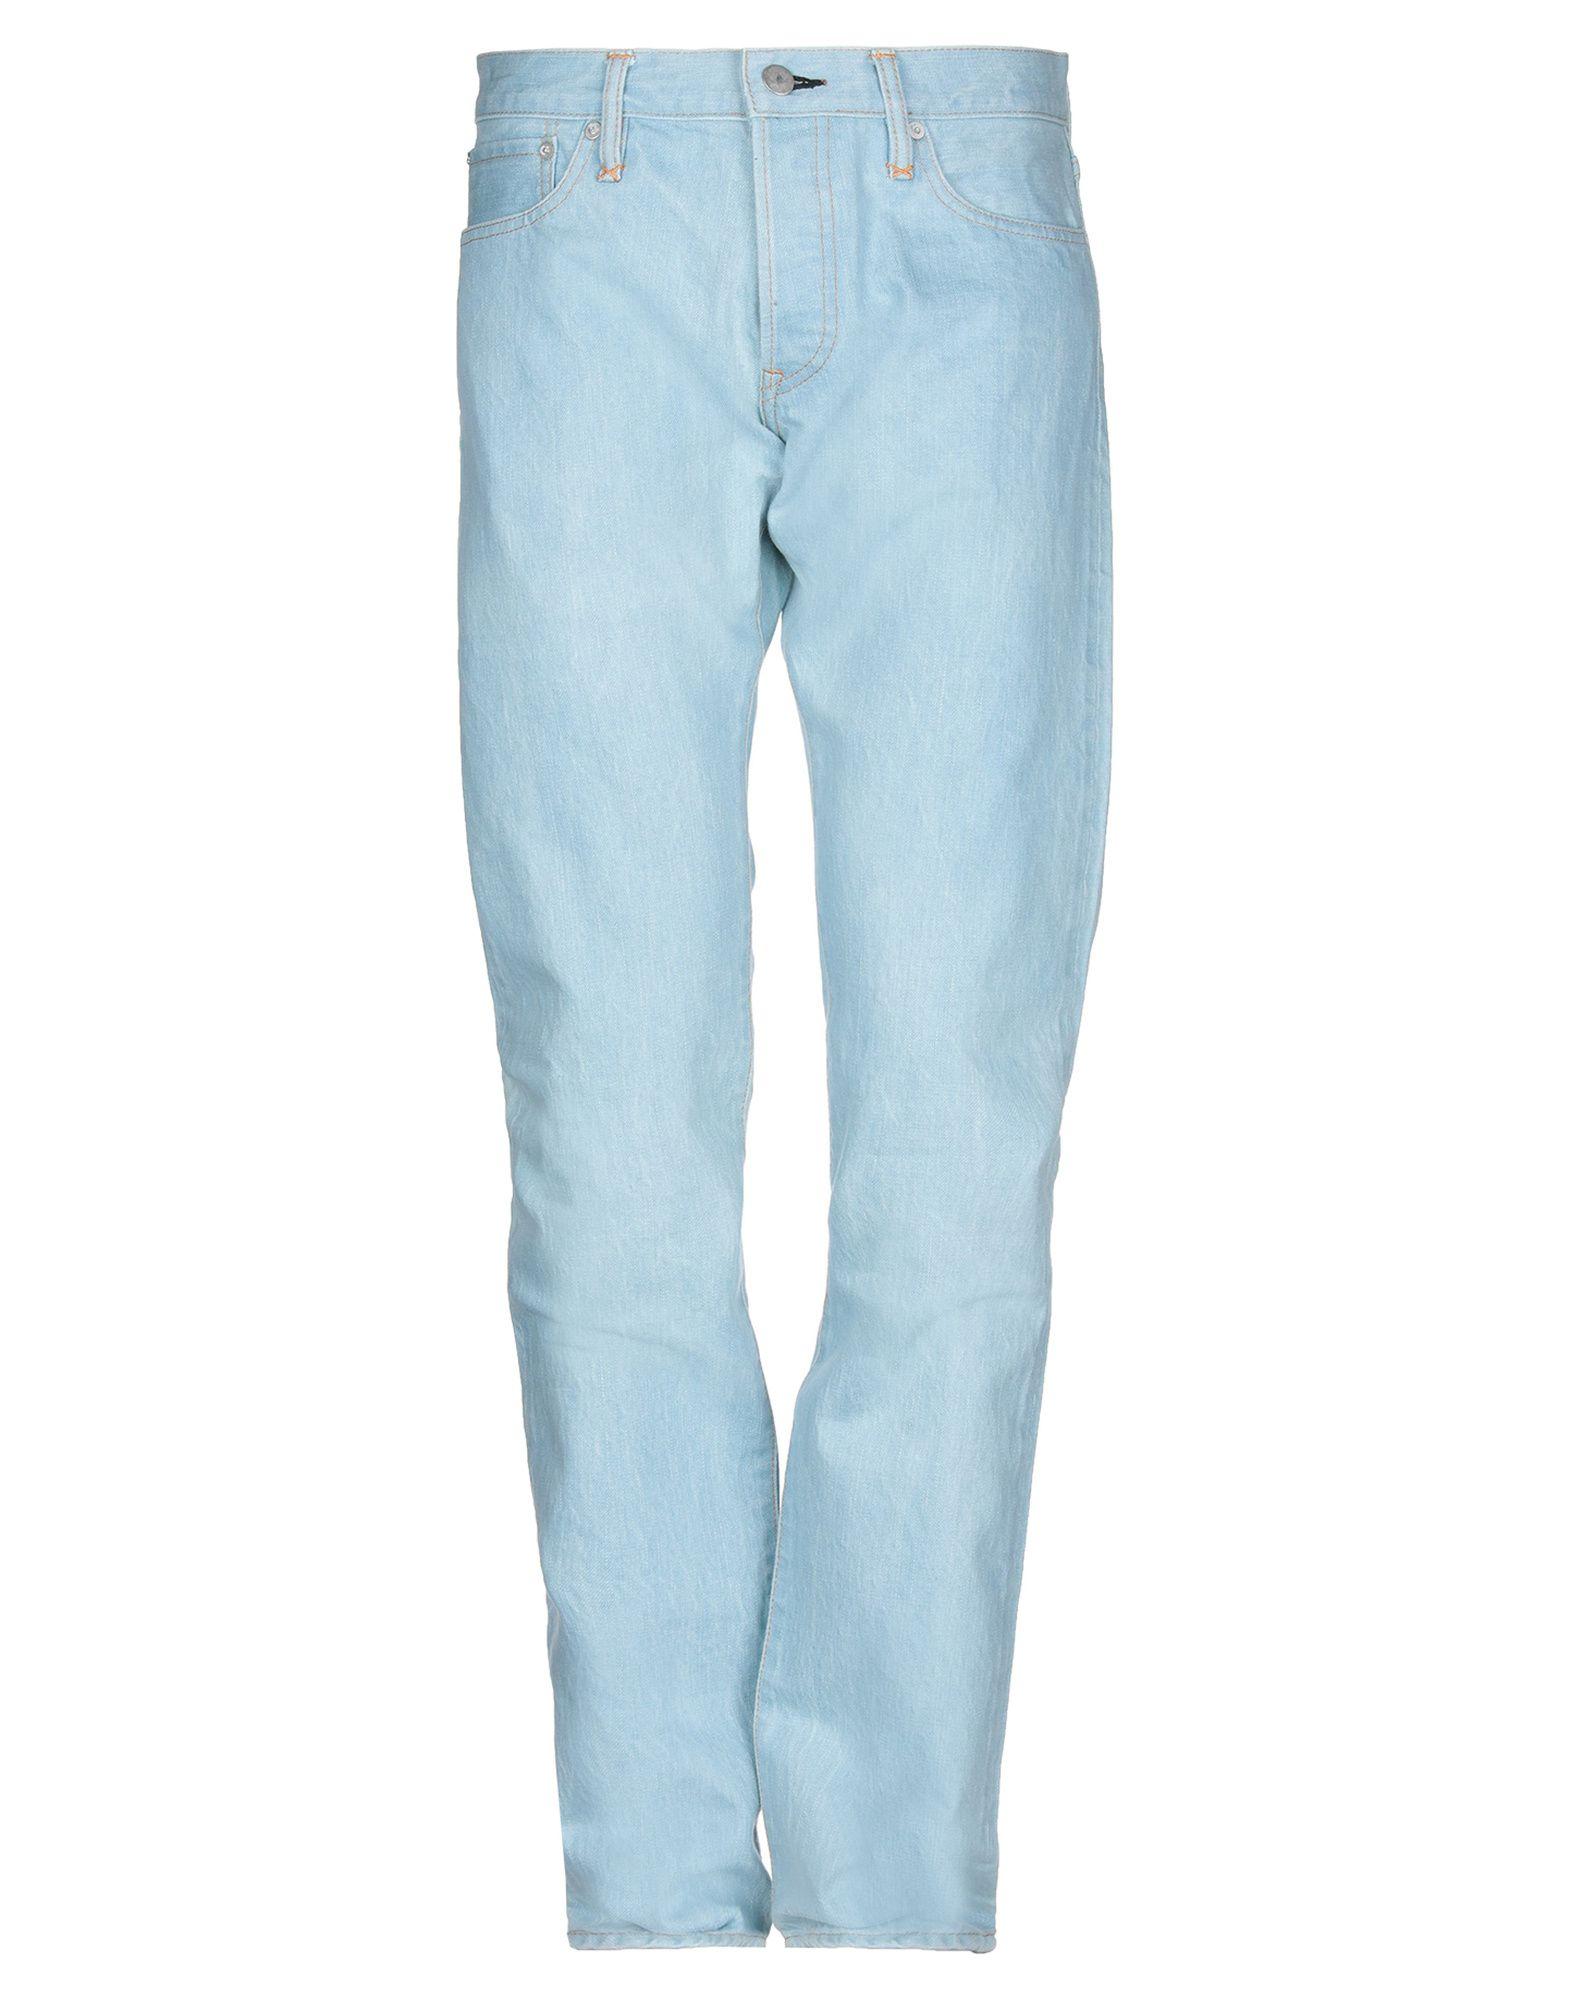 MAISON KITSUNÉ Джинсовые брюки maison kitsuné футболка